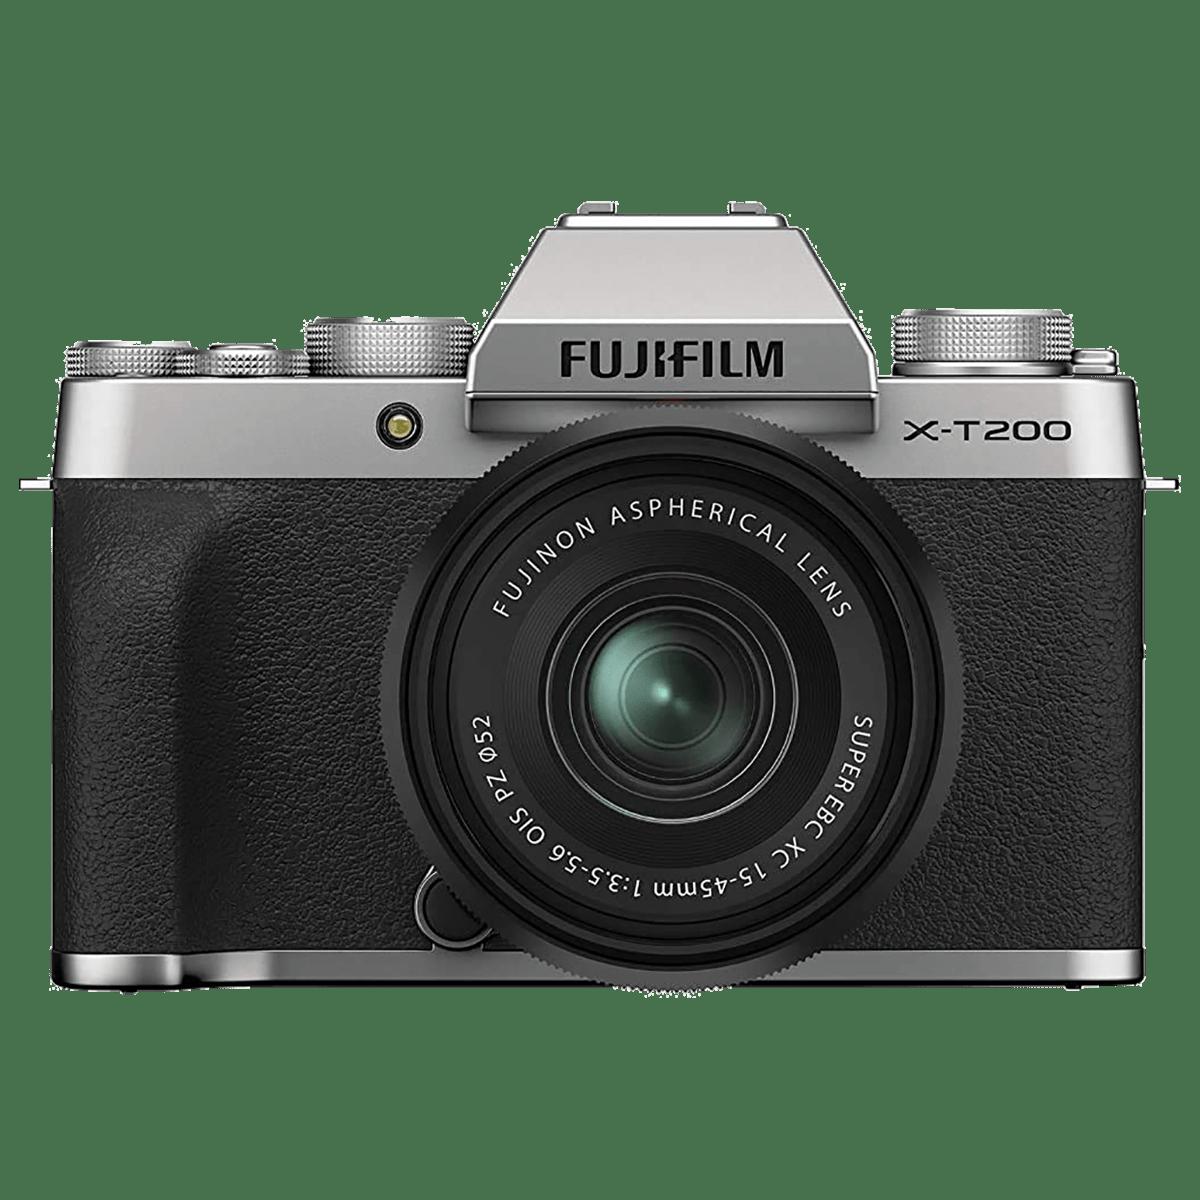 Fujifilm X-T200 24.2MP Mirrorless Camera (Built-in Lens, HDR Movie Mode, 16647123, Silver)_1